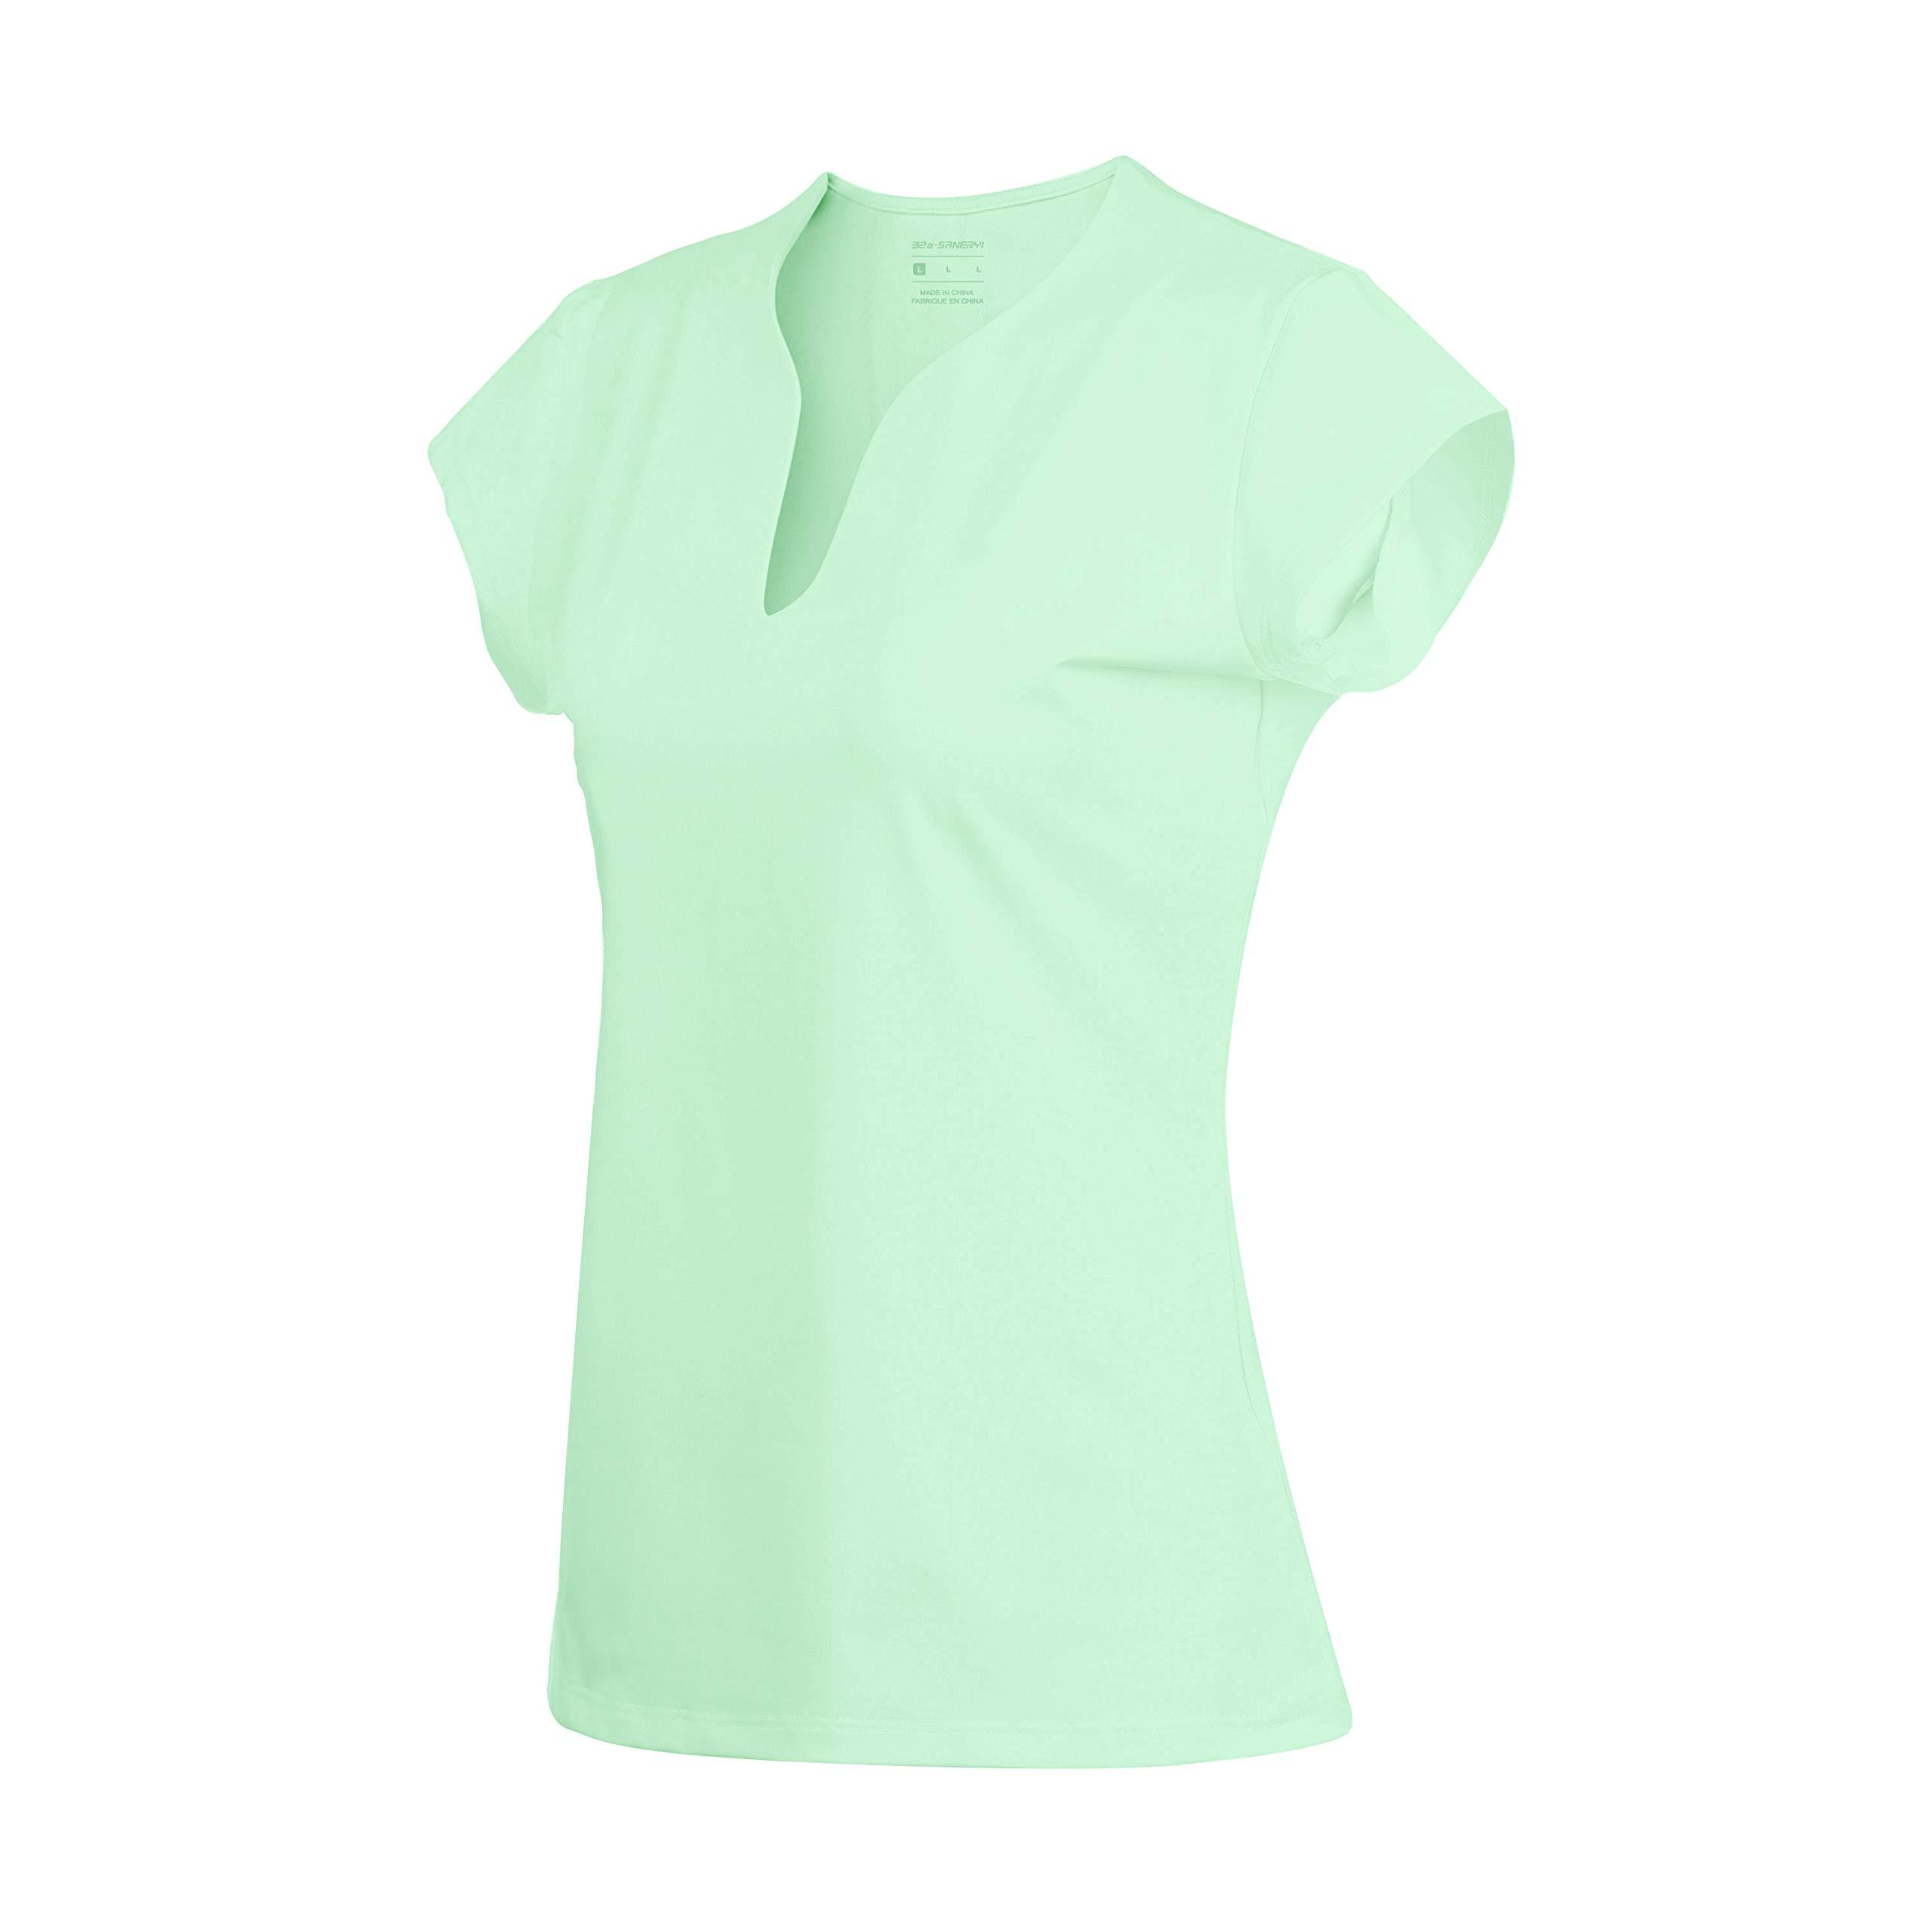 32e-SANERYI Women's V-Neck Pullover Short Sleeve Sports Shirts Quick-Drying Tees (S, Mint Green)